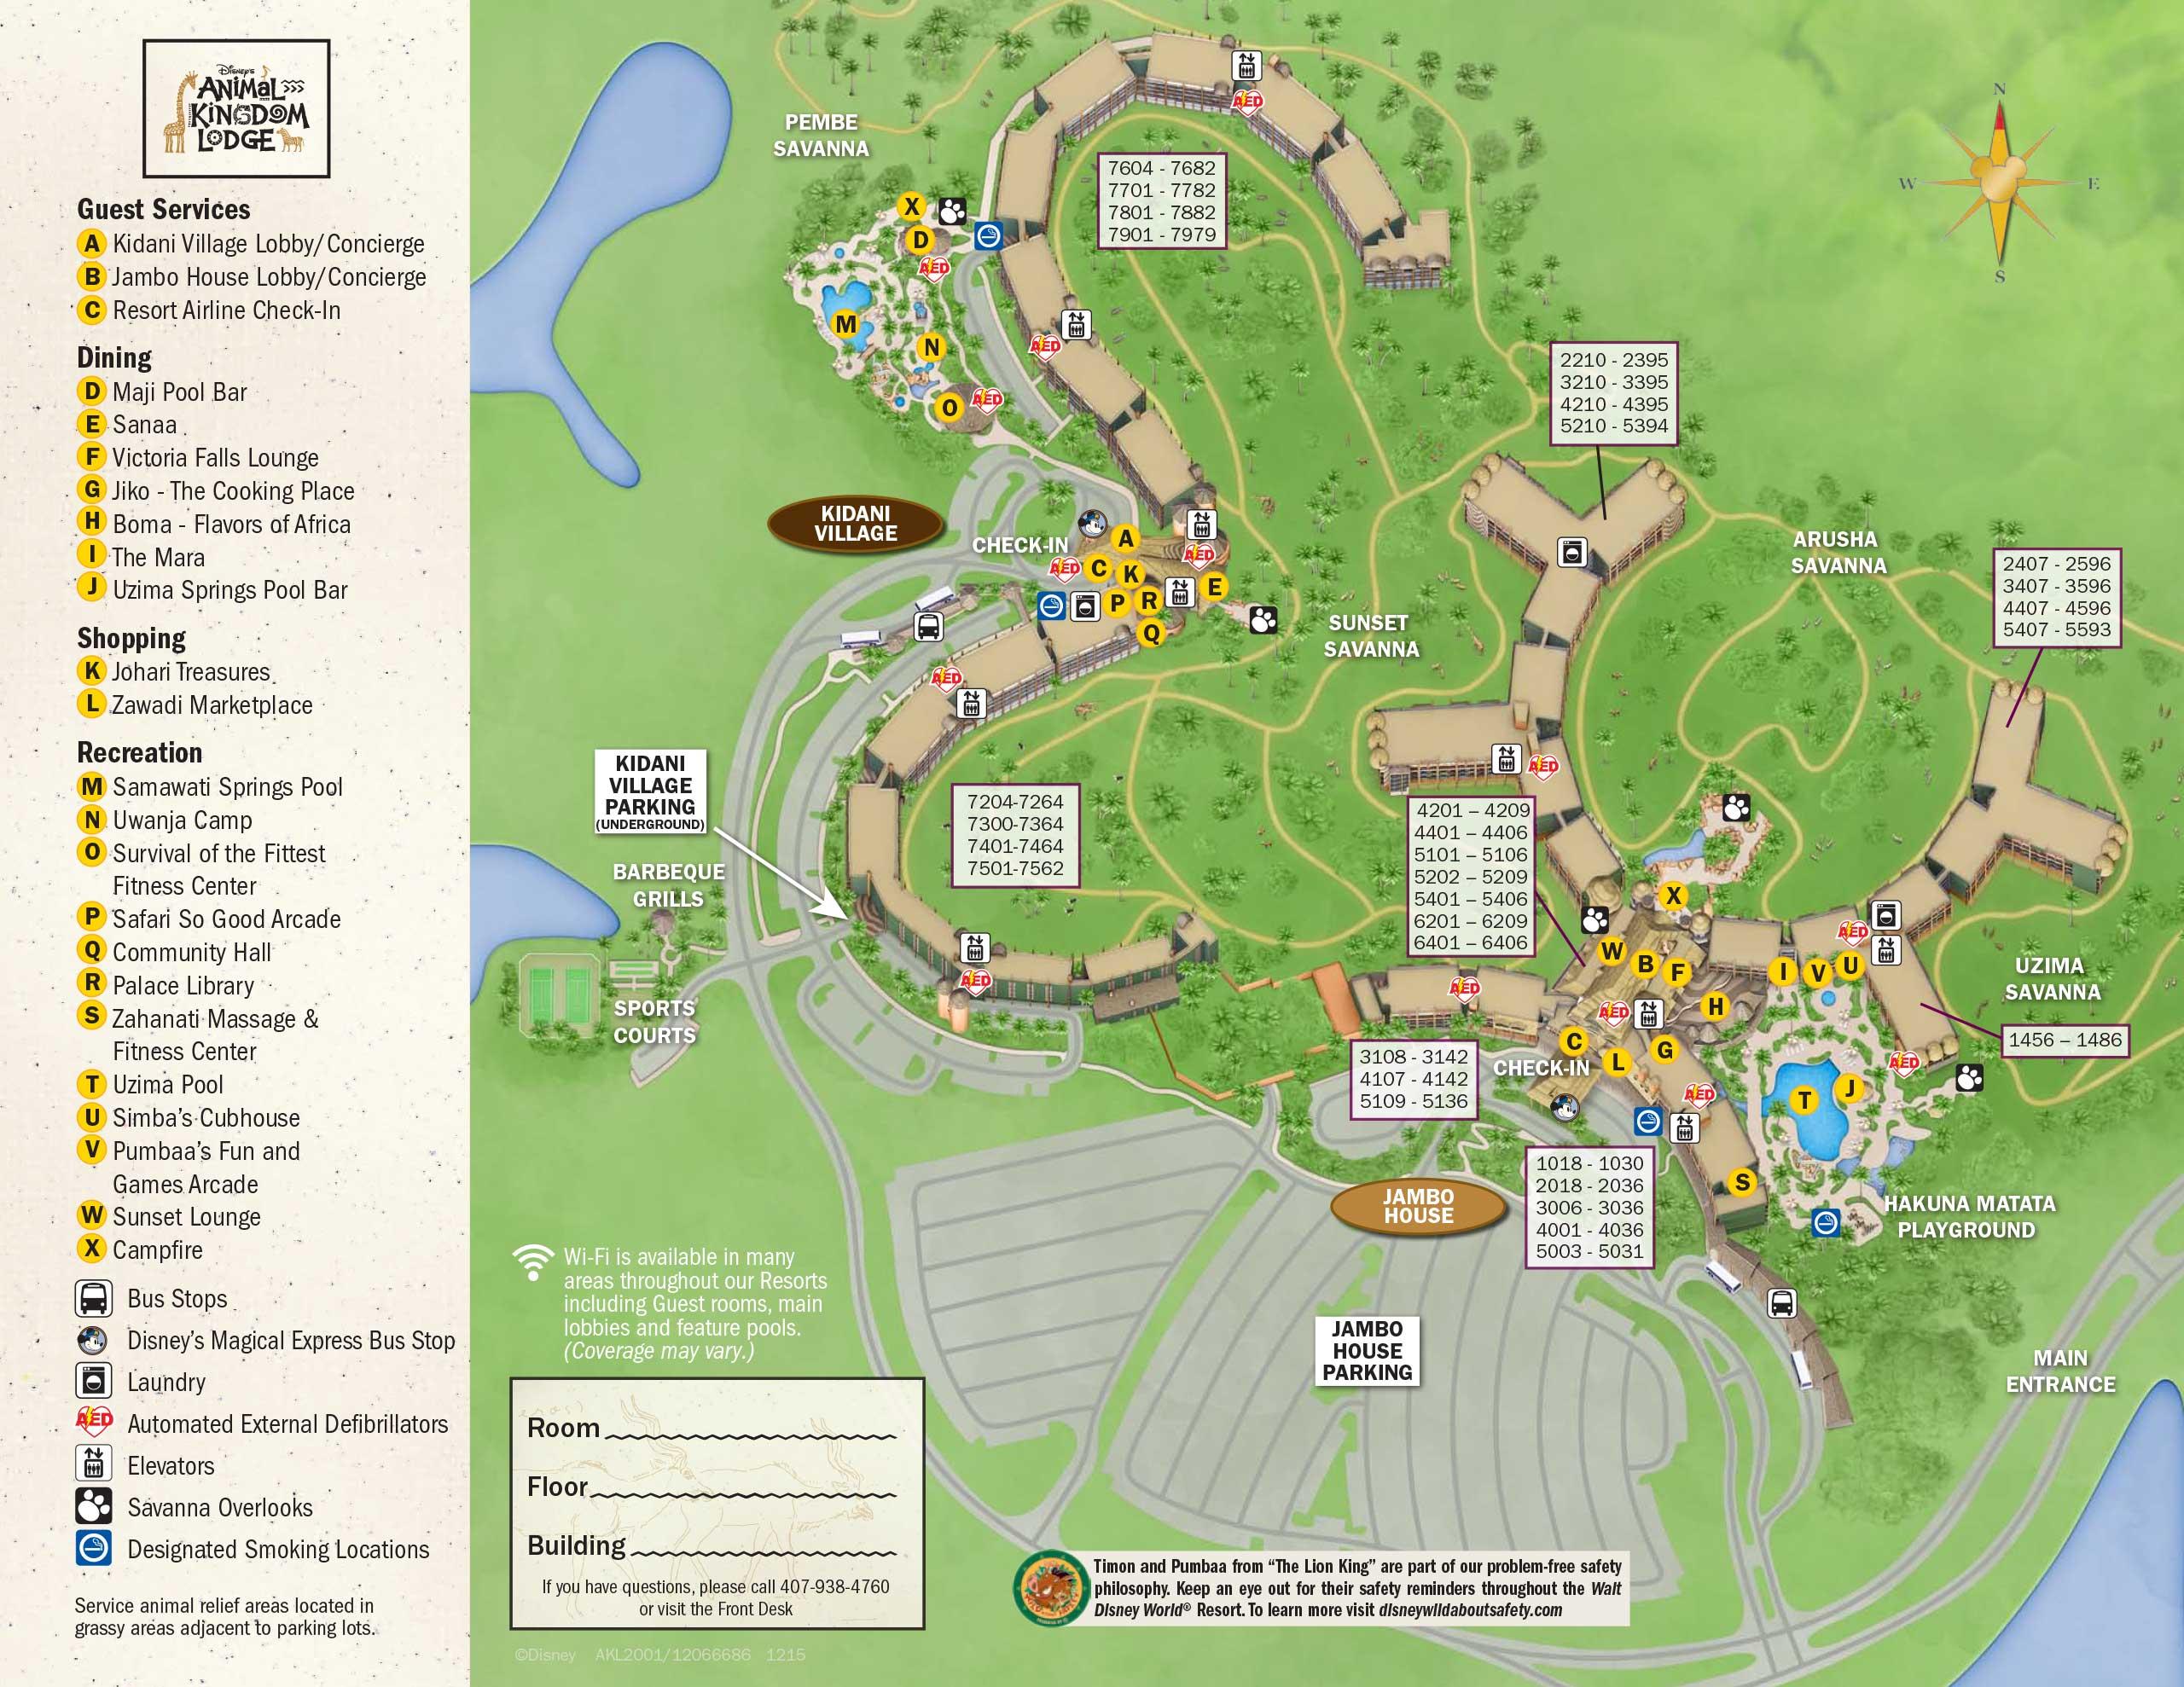 Walt Disney World Map With Hotels.April 2017 Walt Disney World Resort Hotel Maps Photo 22 Of 33